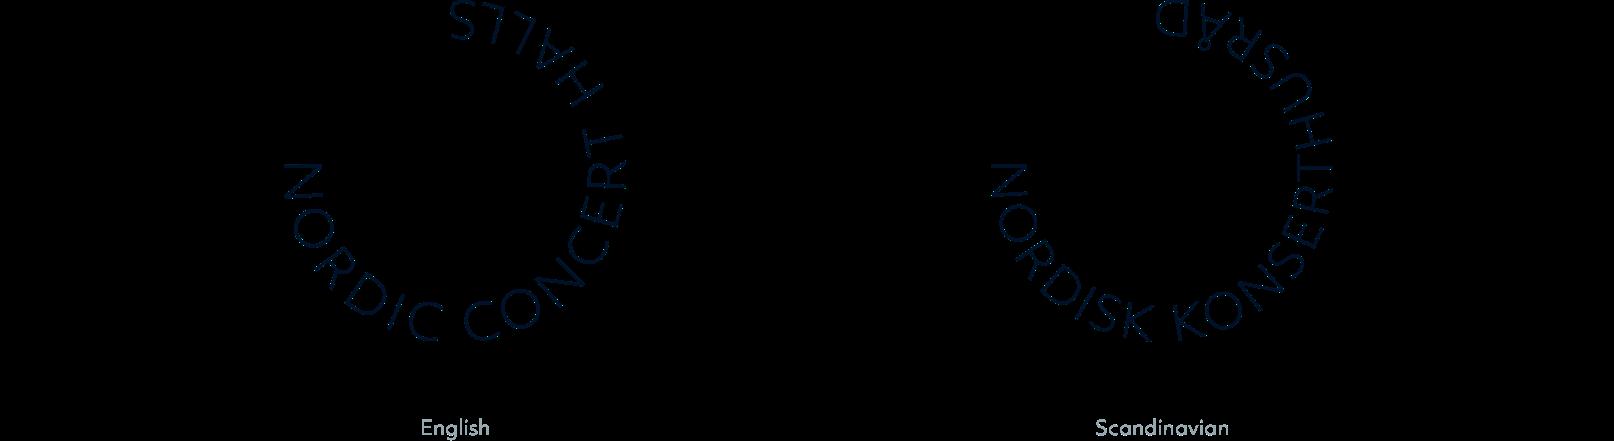 nordicconcerthalls_logo2